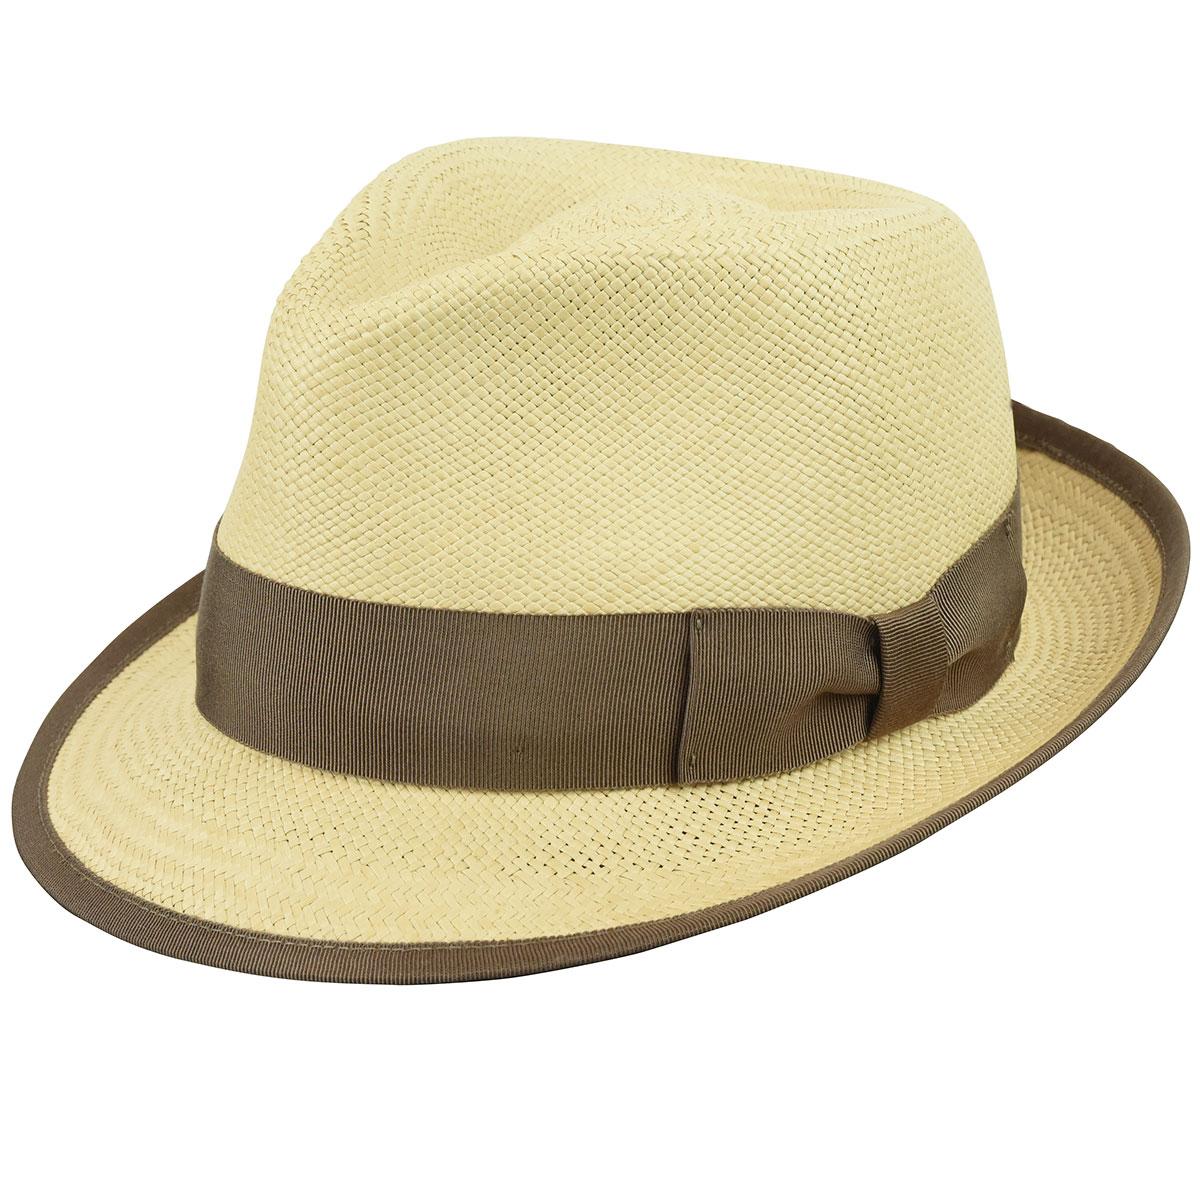 1950s Mens Hats | 50s Vintage Men's Hats Riviera Panama $78.00 AT vintagedancer.com